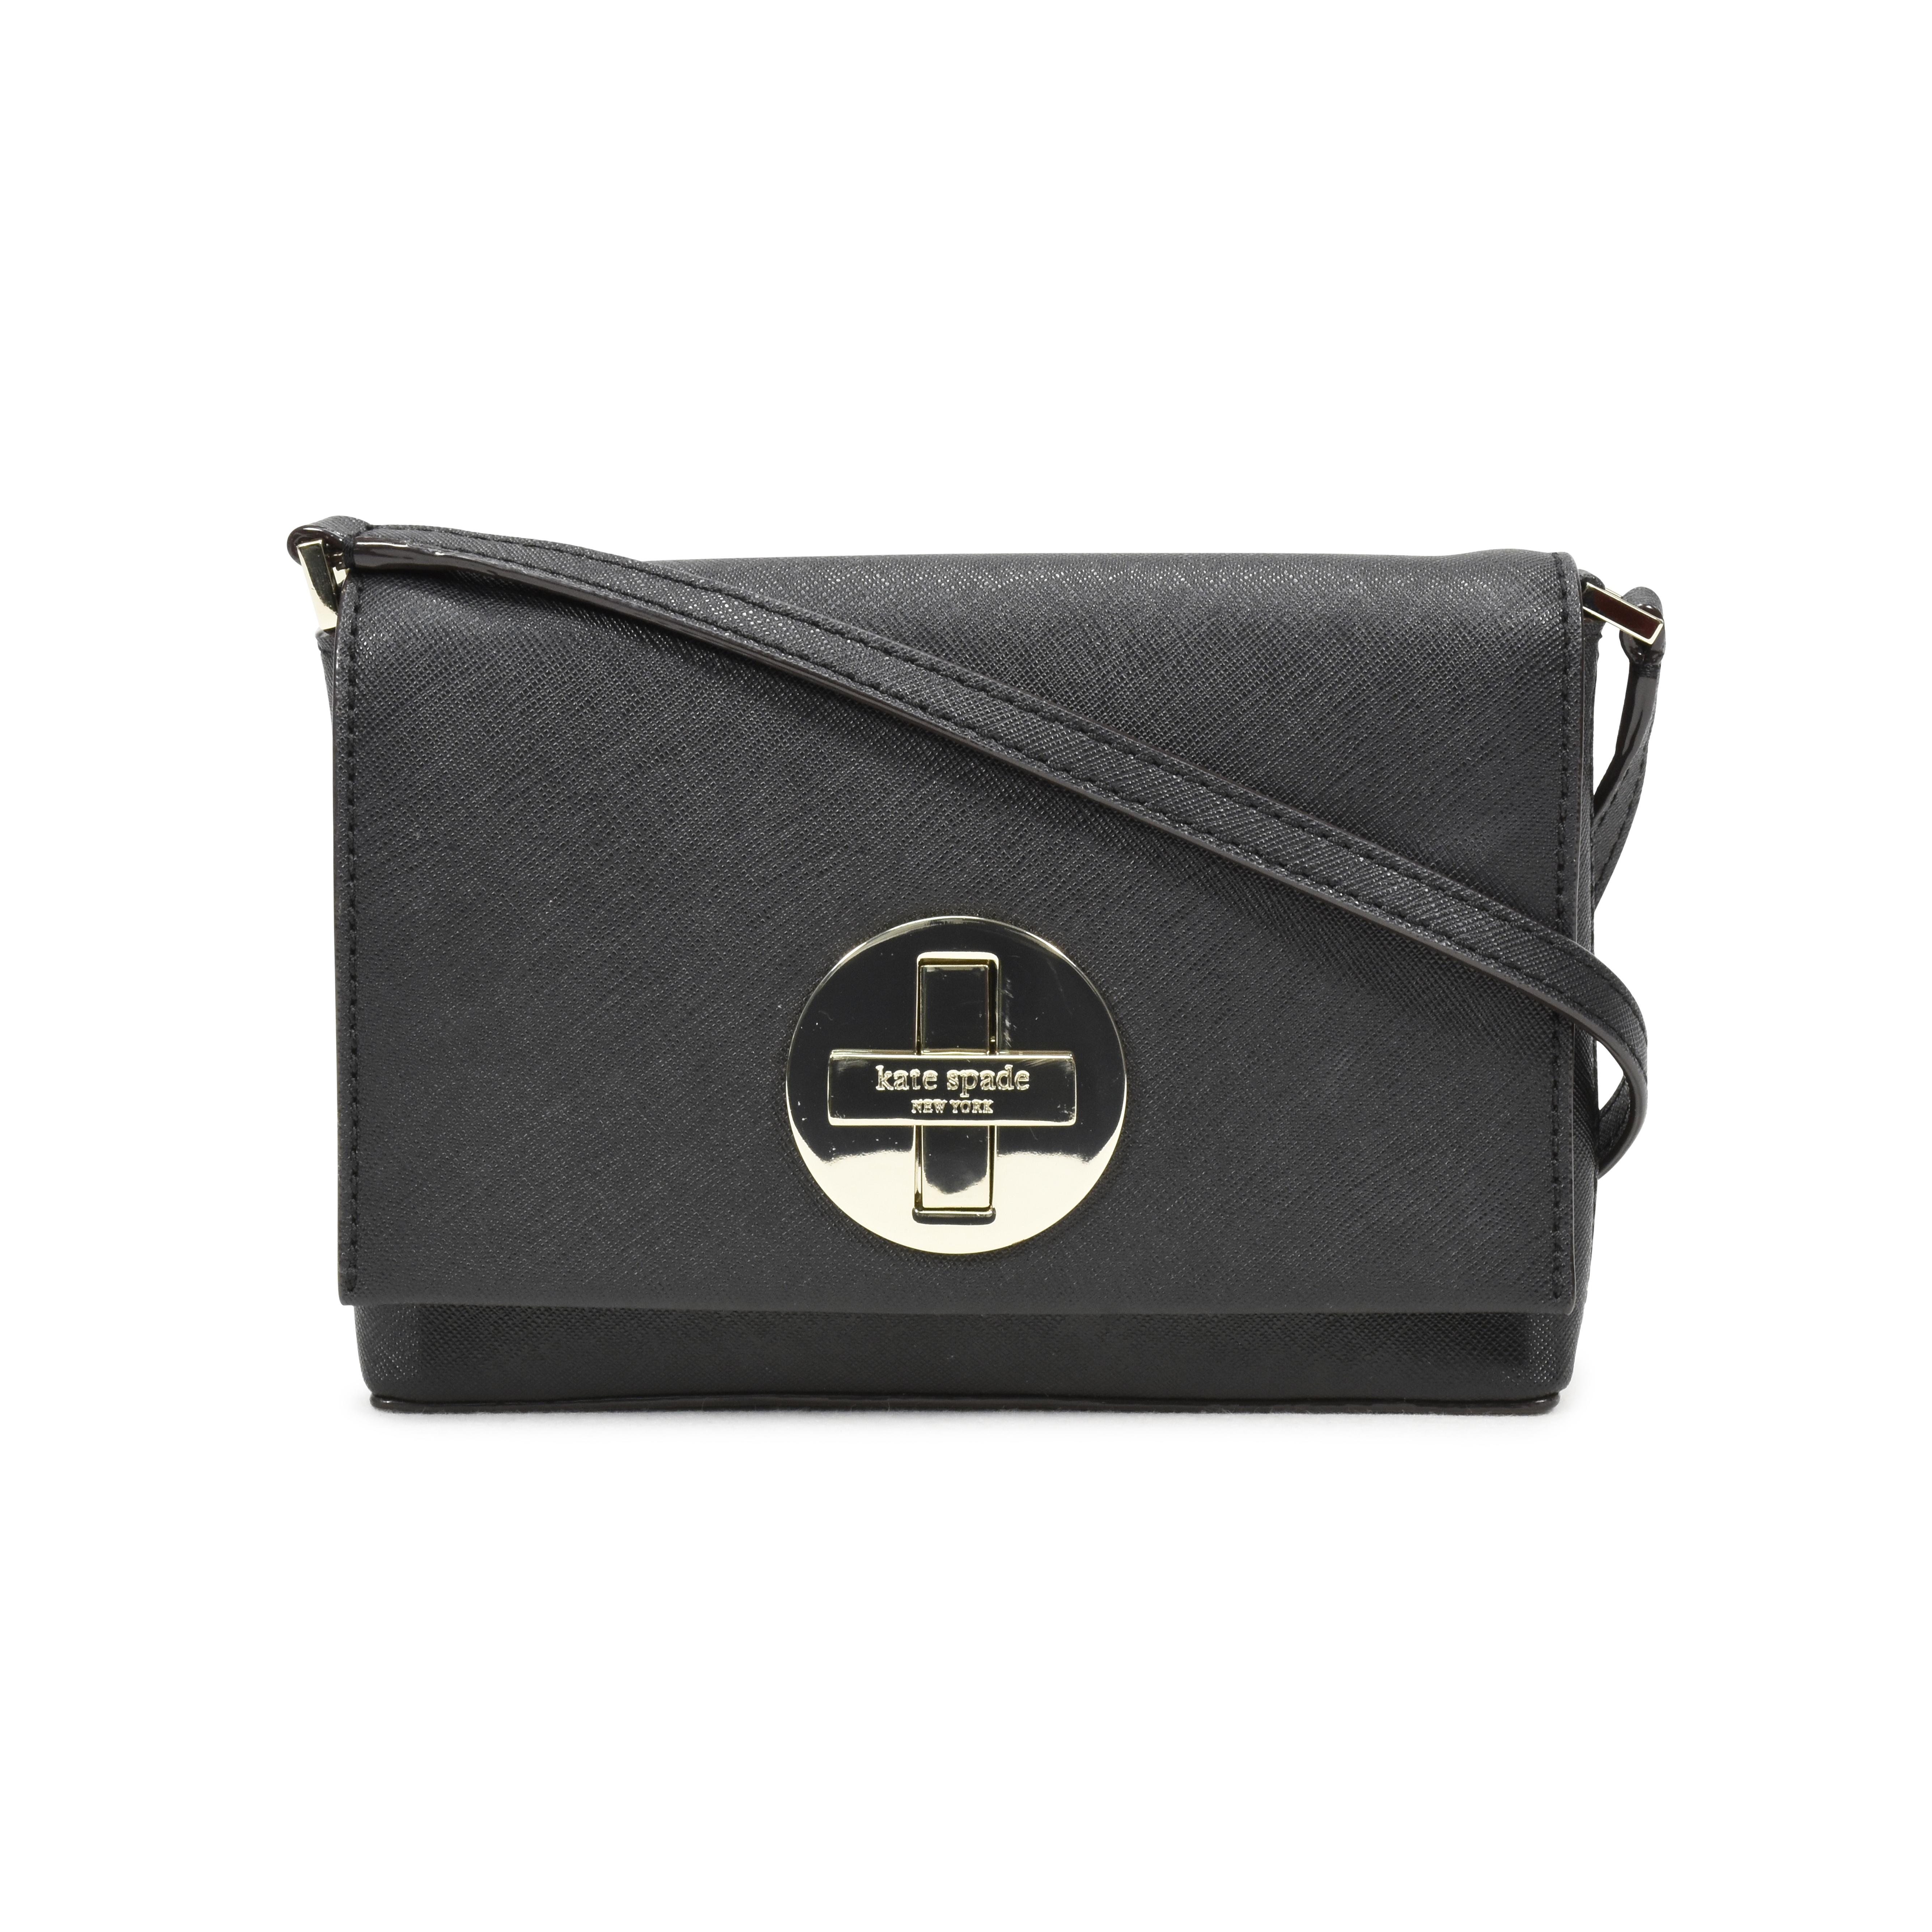 ba240113bb Authentic Second Hand Kate Spade Sally Newbury Lane Crossbody Bag  (PSS-366-00005)